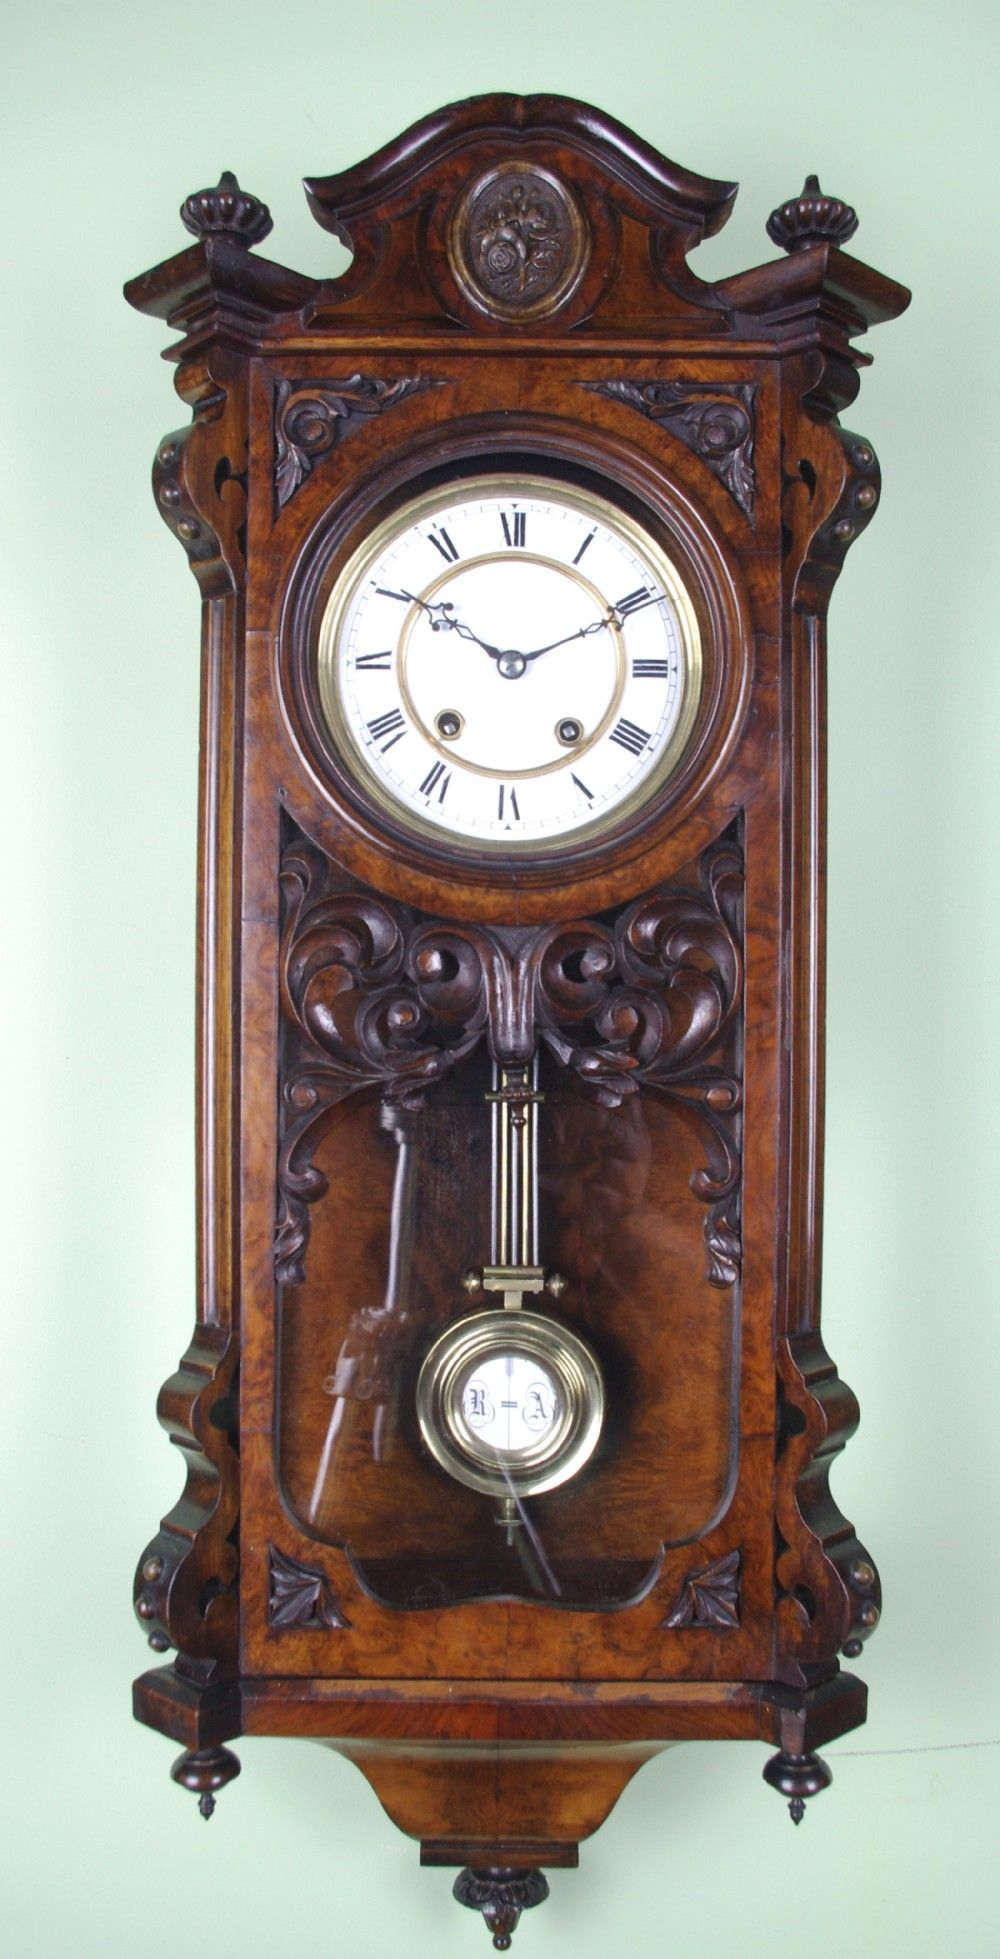 Fabulous lenzkirch wall clock pinteres fabulous lenzkirch wall clock more amipublicfo Image collections